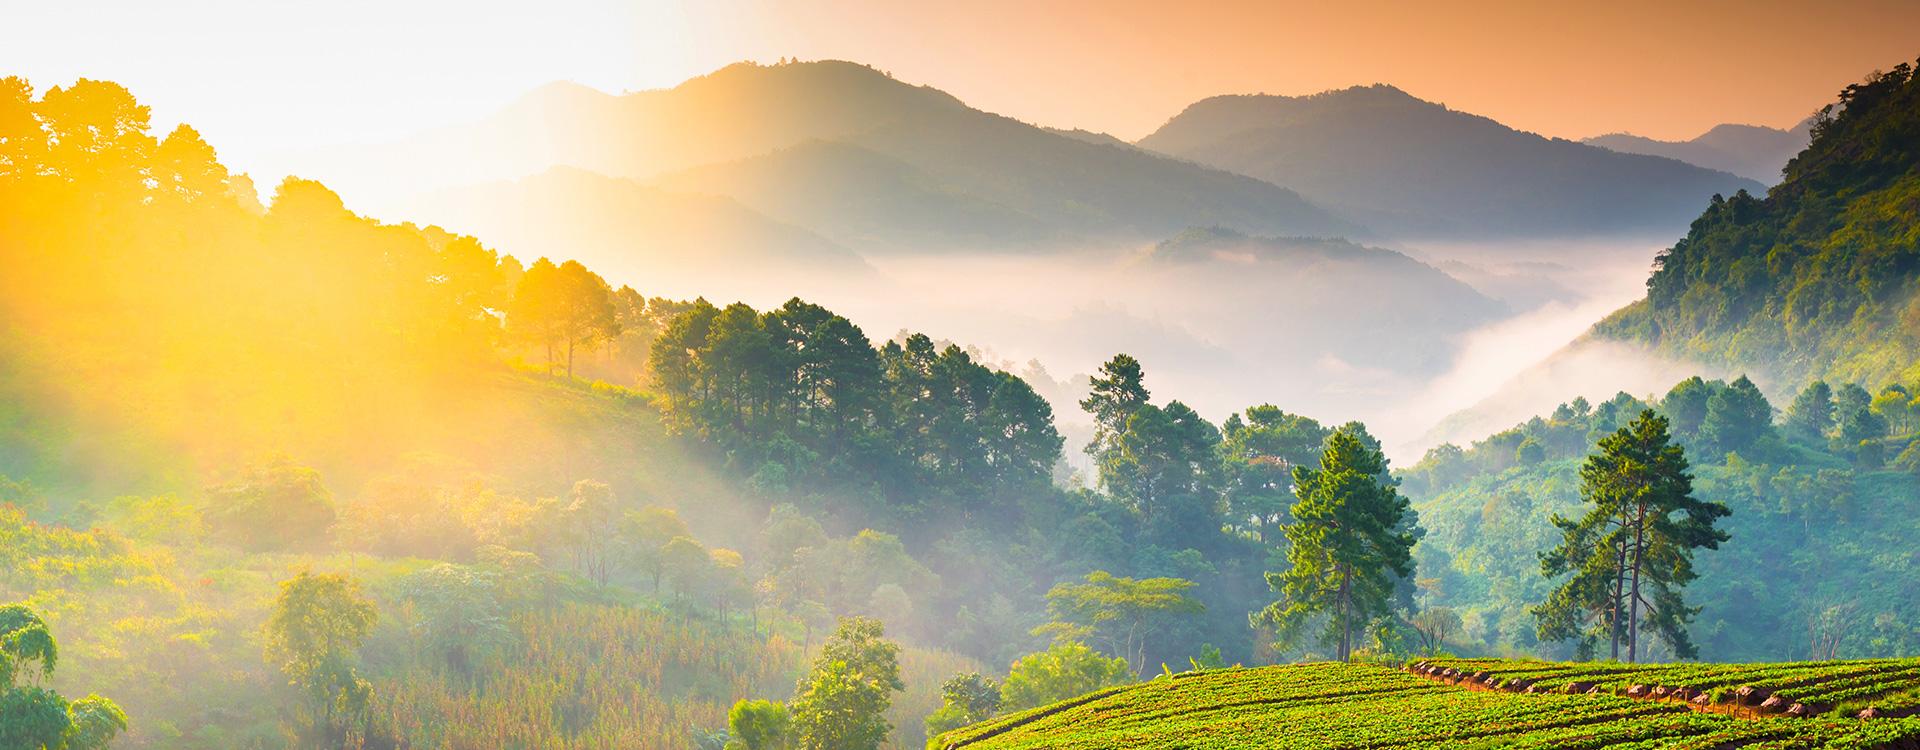 Sonnenaufgang in den Bergen | Tiger Balm